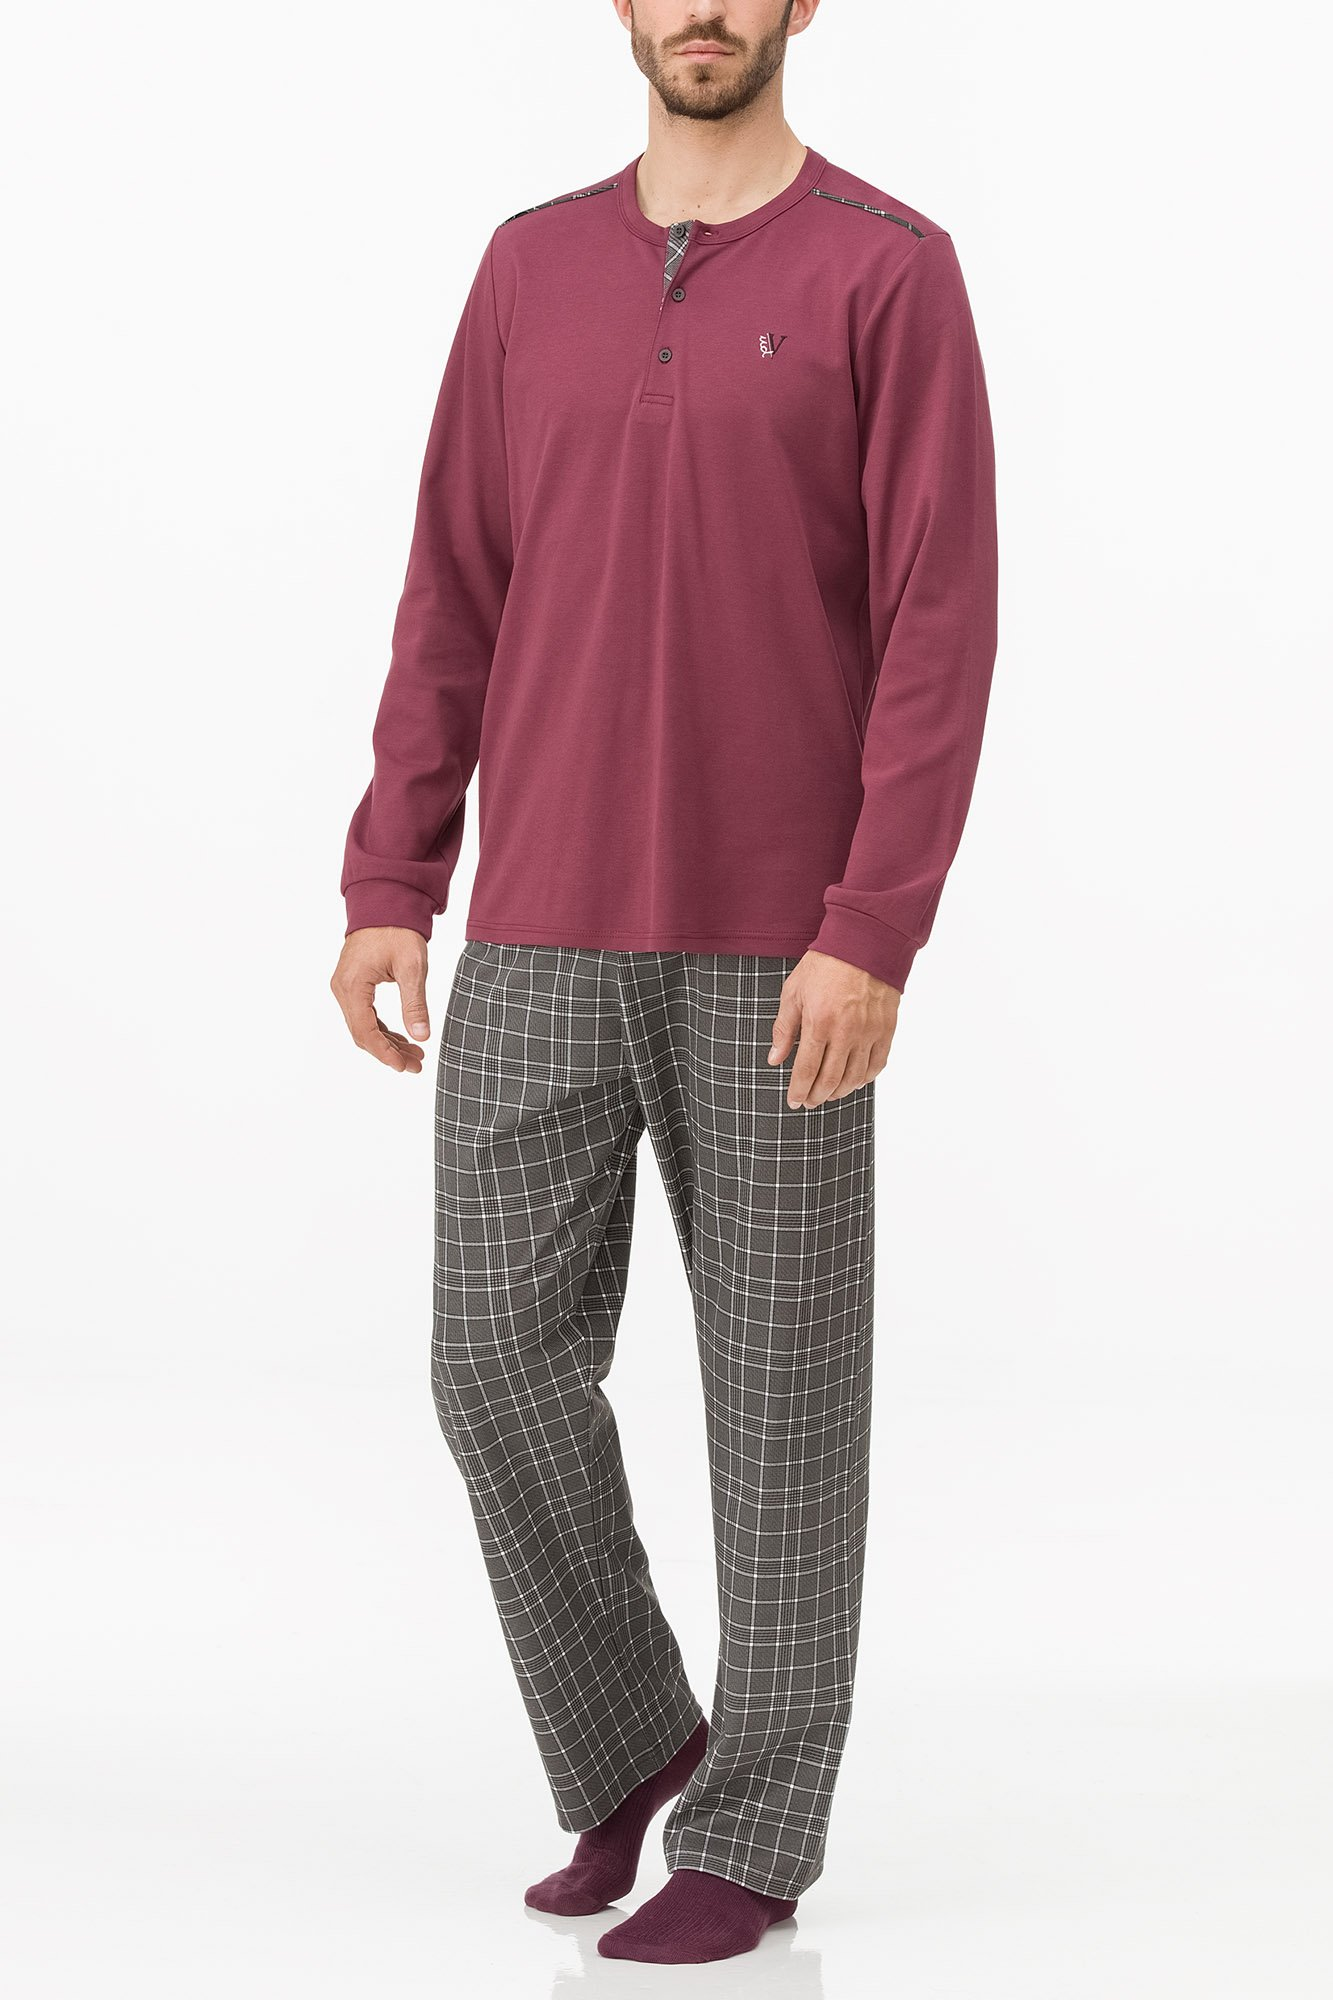 Vamp - Pohodlné pánske pyžamo 11683 - Vamp bordeaux imperial 5XL